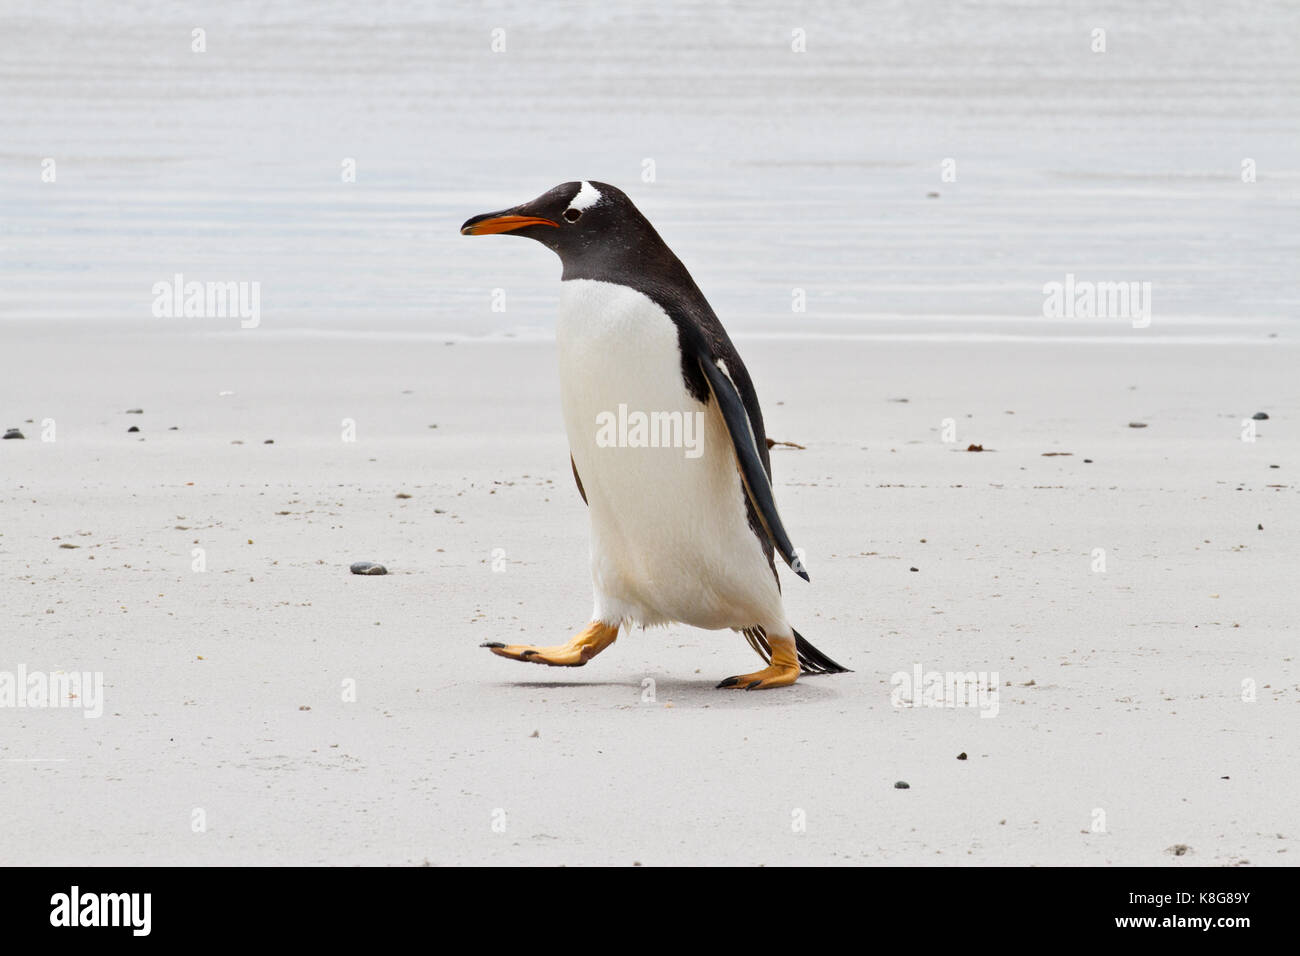 Gentoo penguin, Falkland Islands Stock Photo